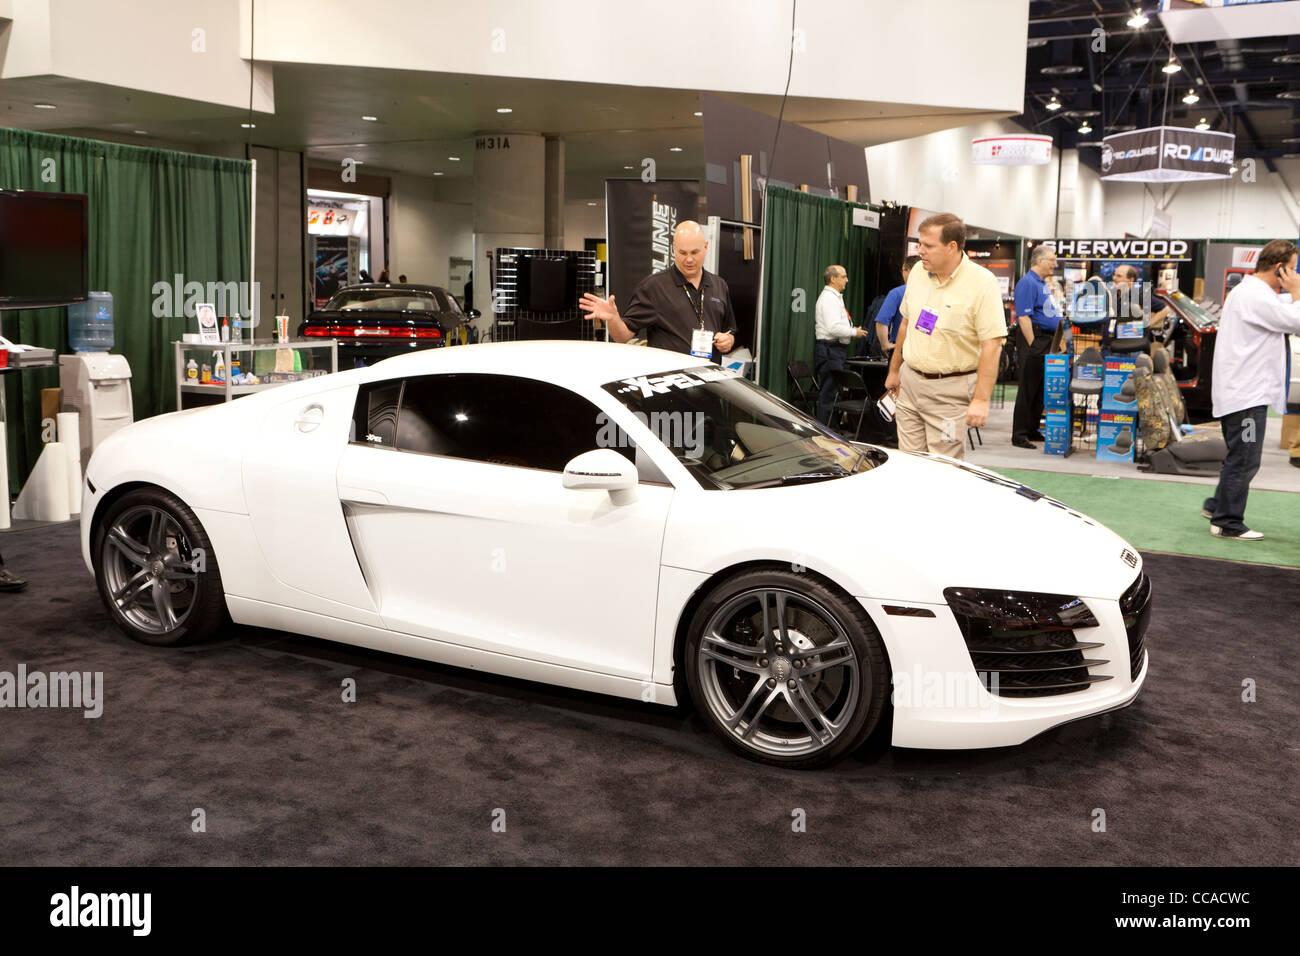 2012 Audi R8 sports car at SEMA - Stock Image